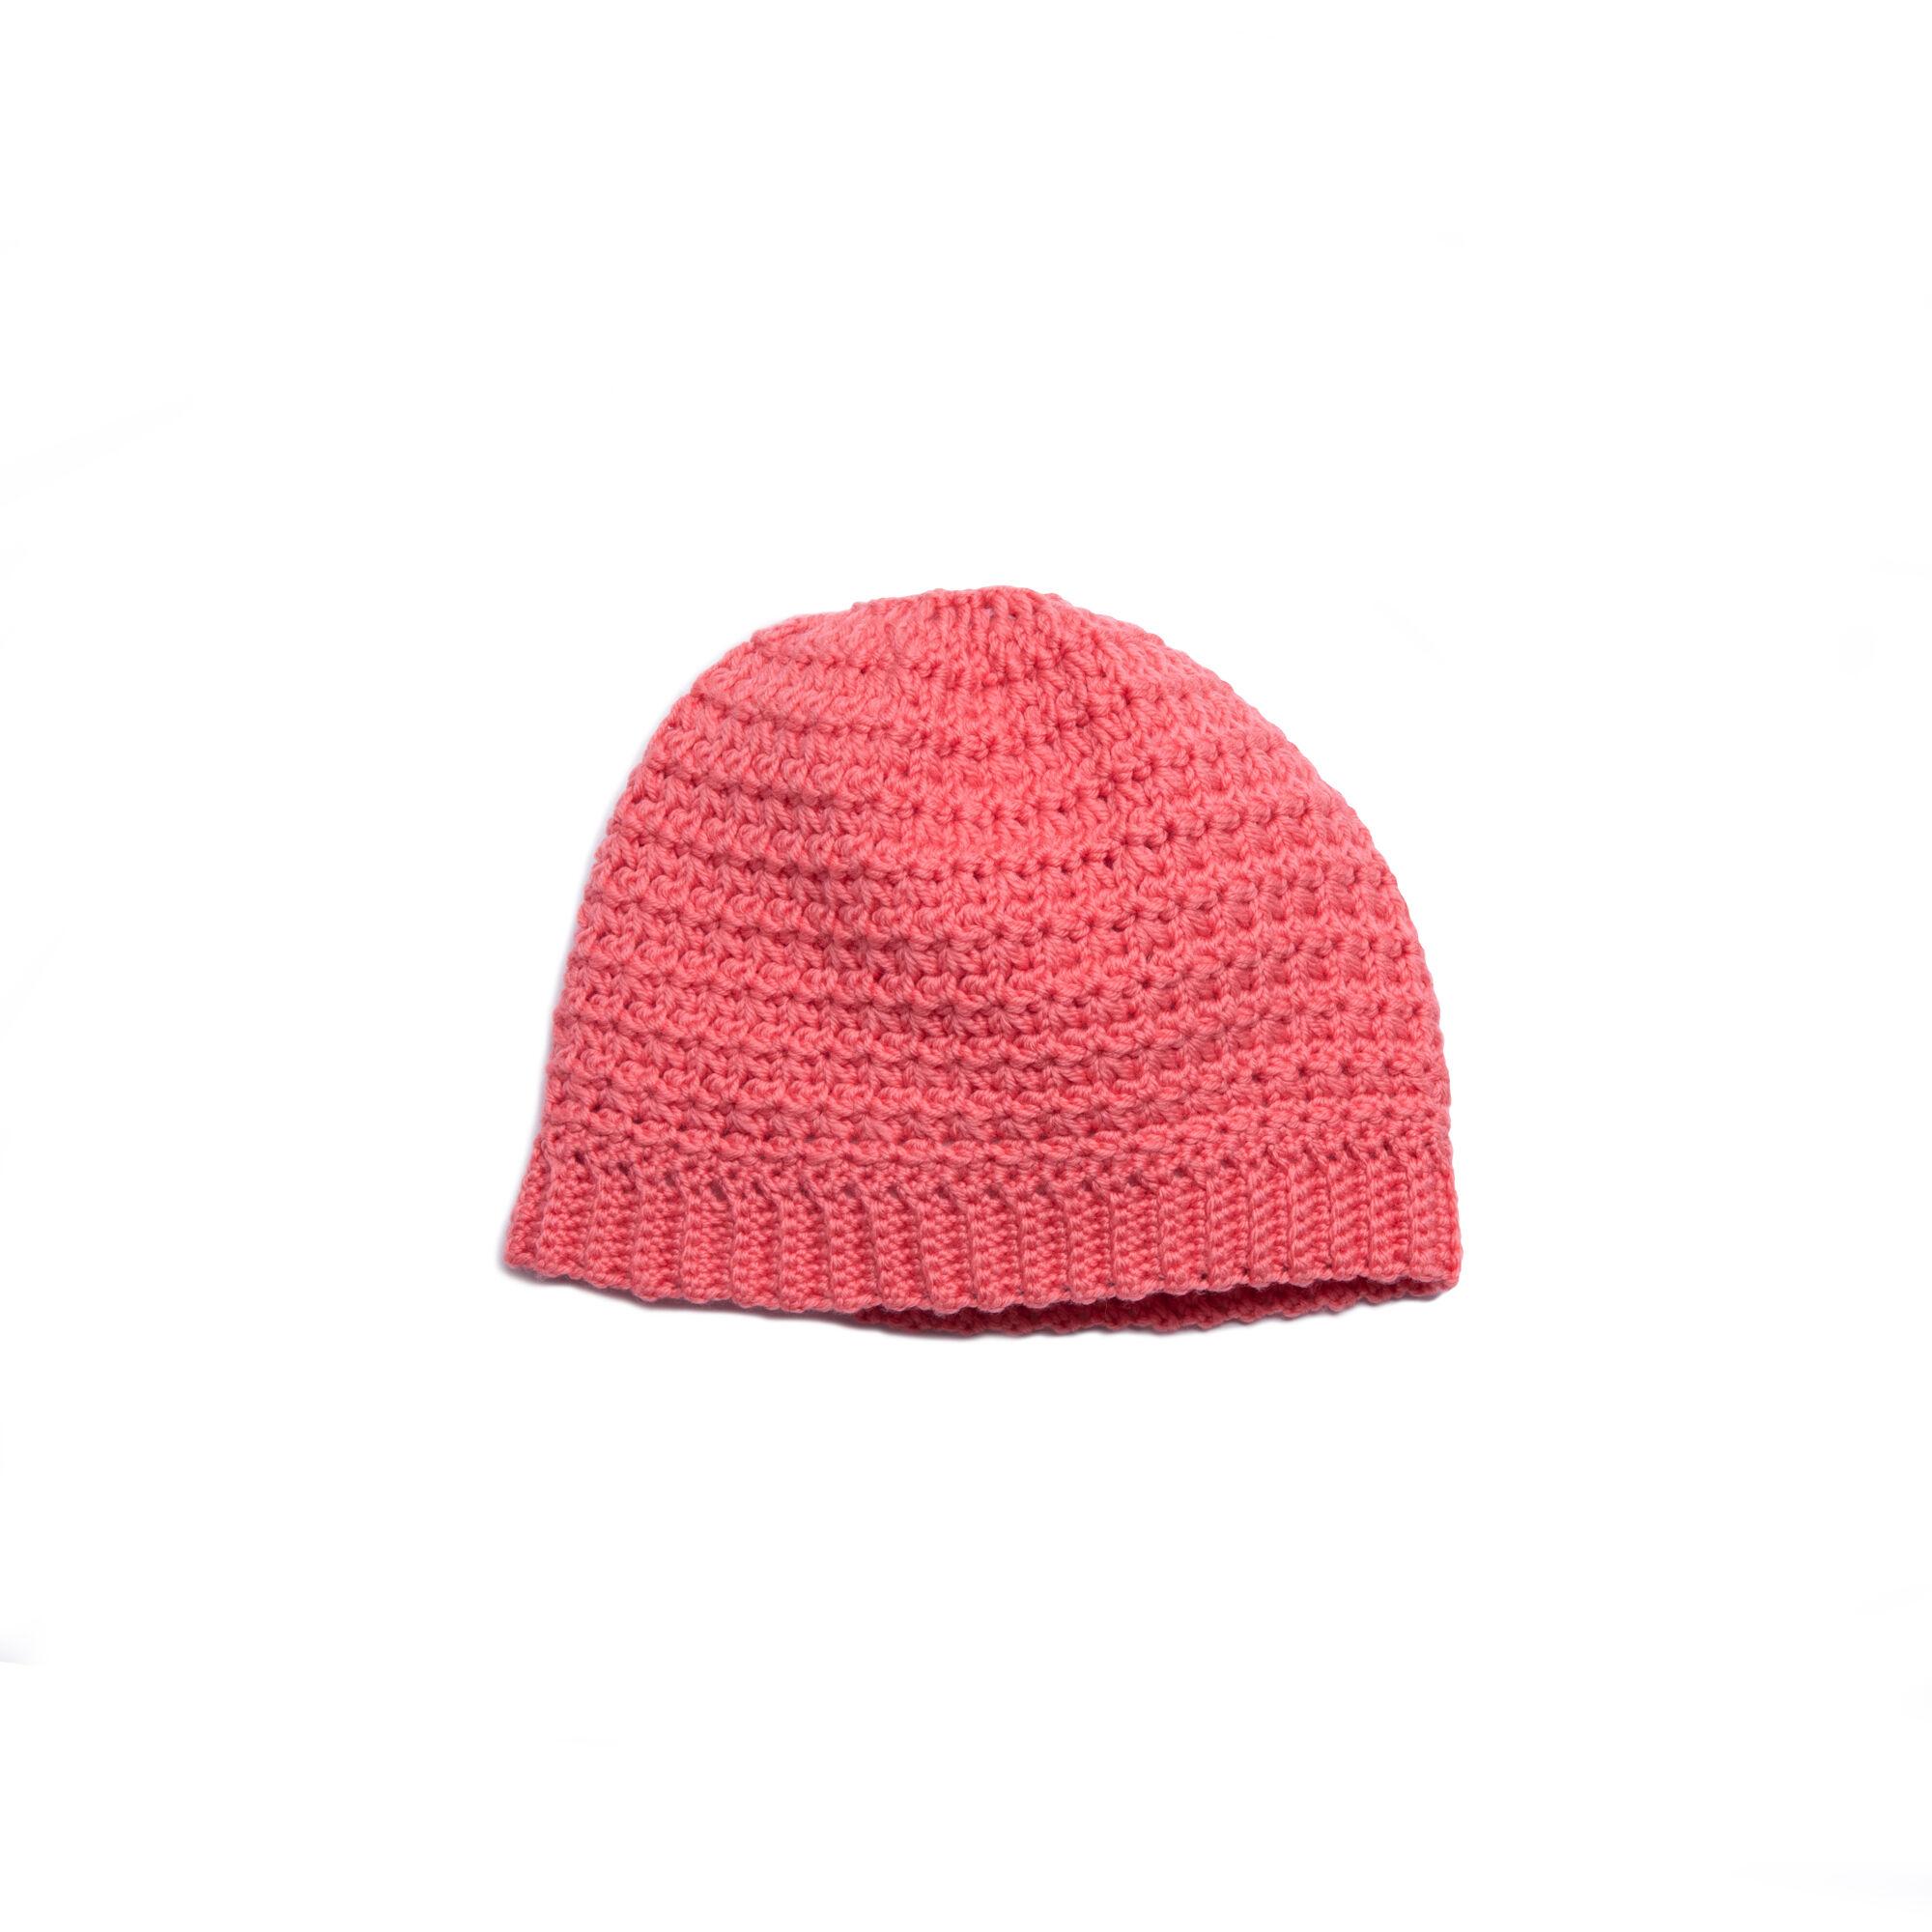 Trinity Crochet Hat